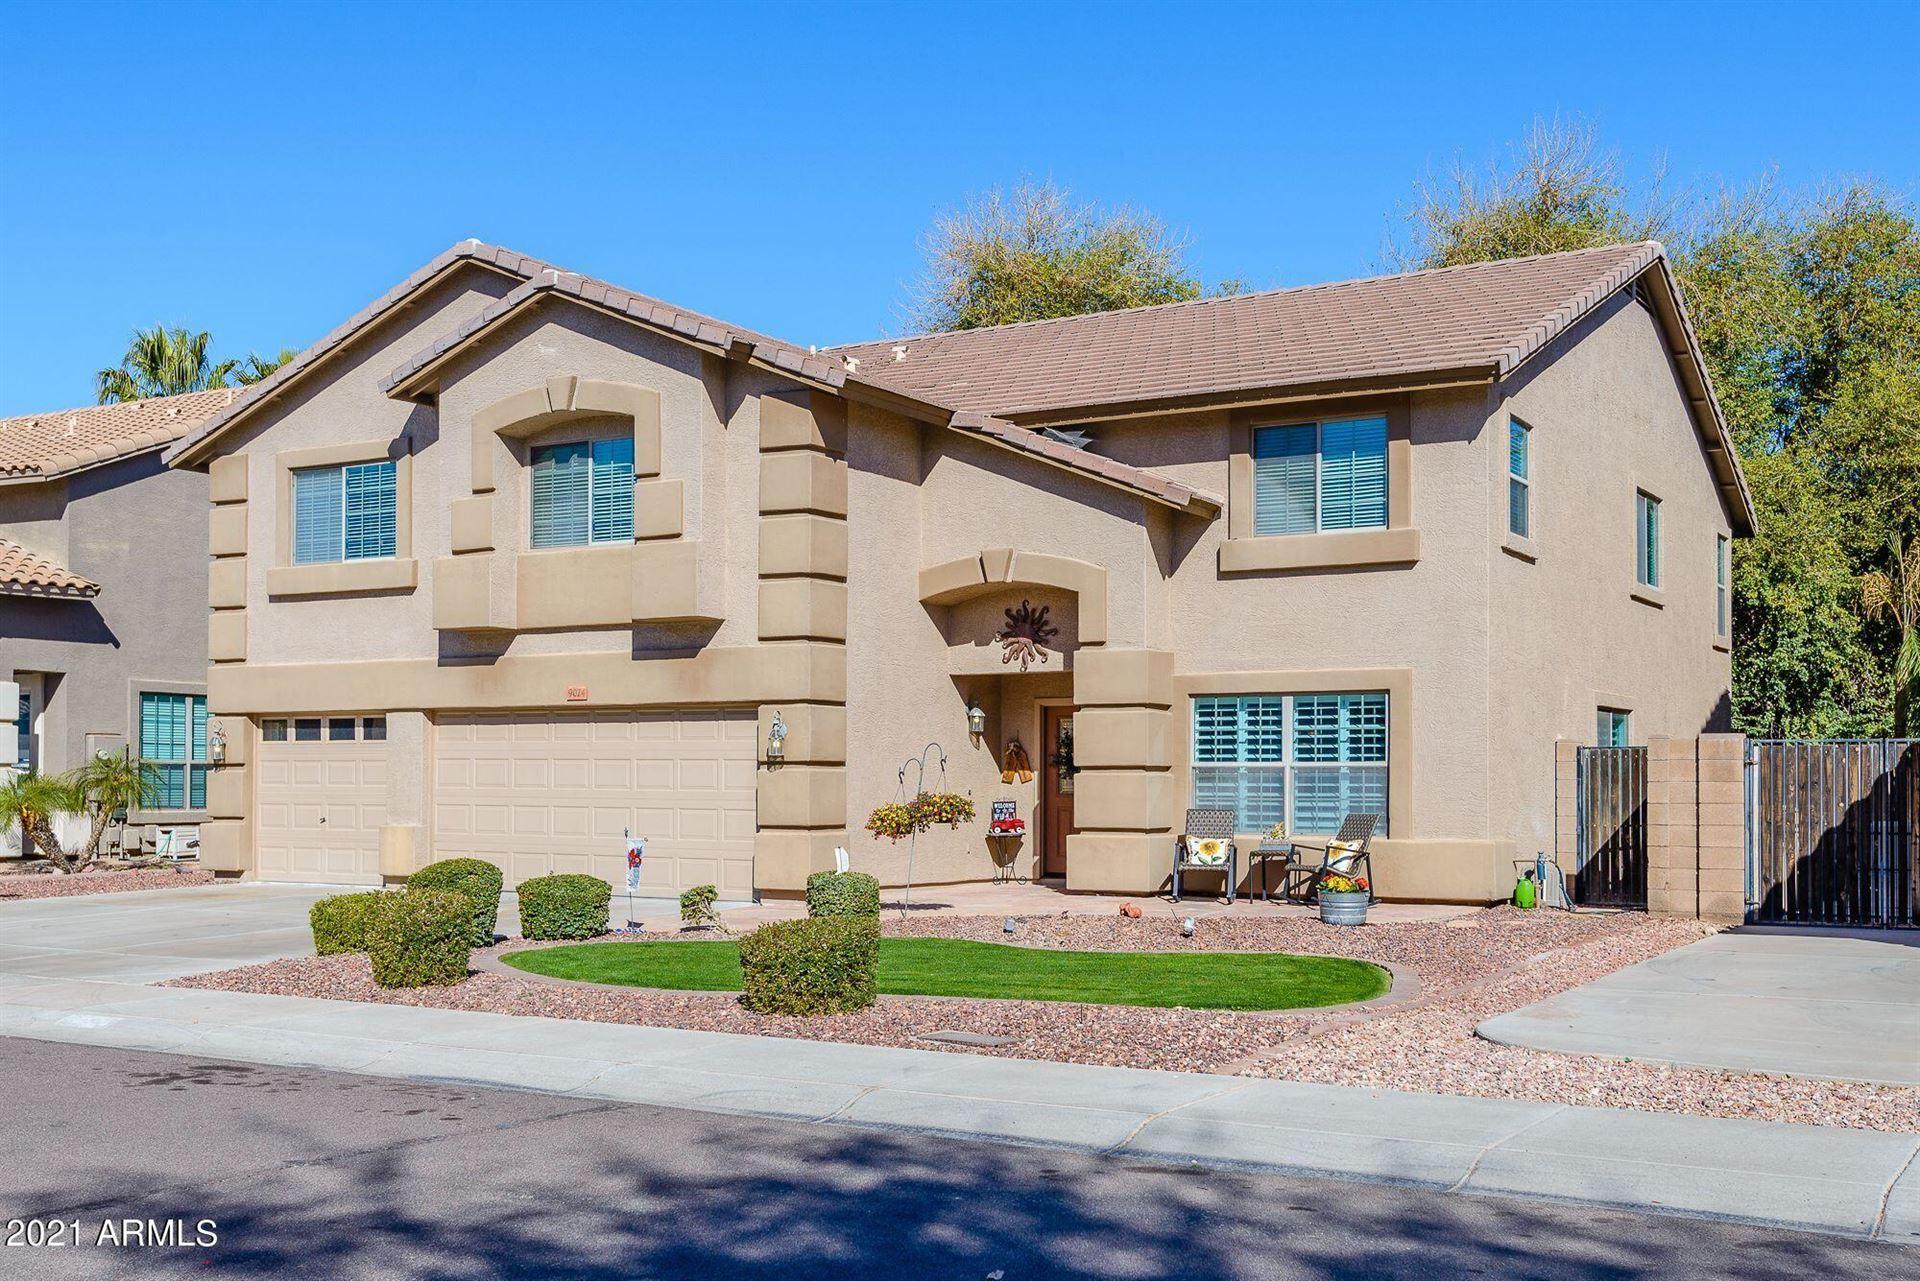 9024 W YUKON Drive, Peoria, AZ 85382 - MLS#: 6199565